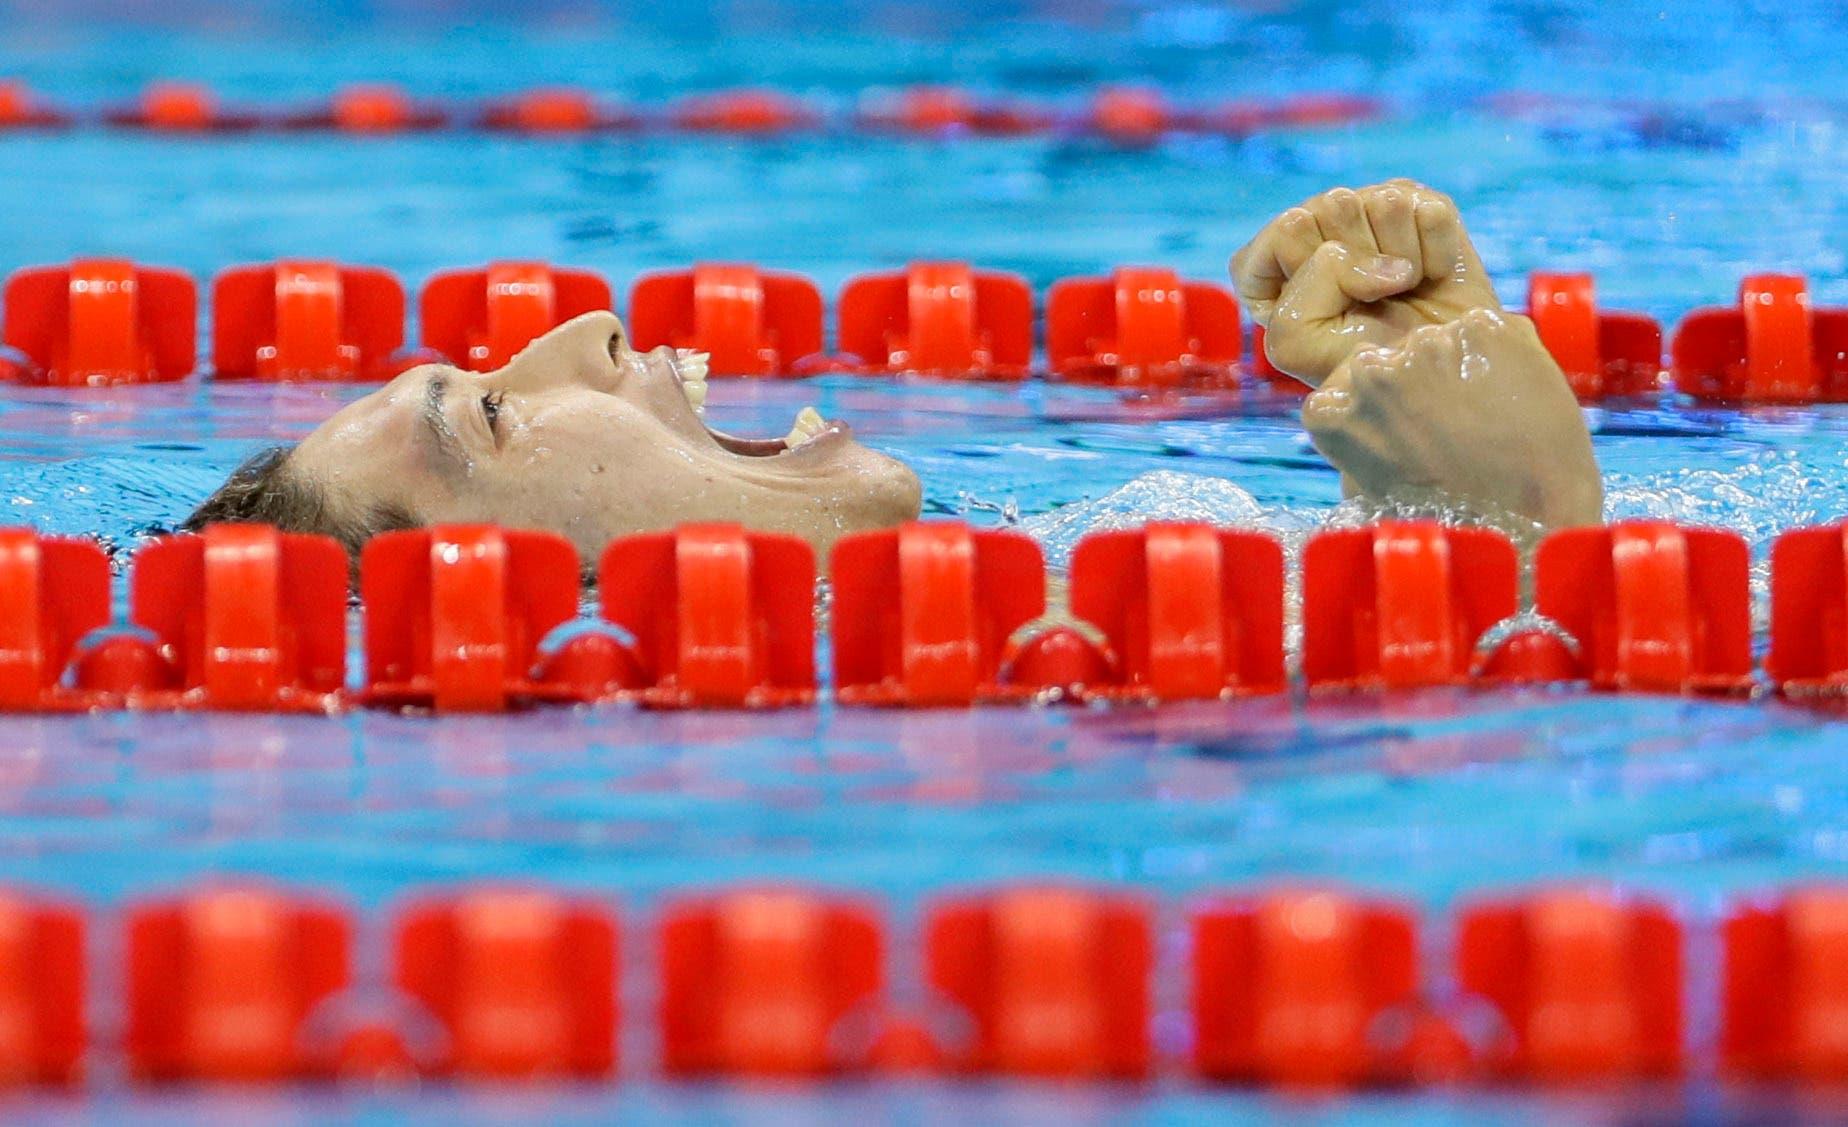 Japan's Kosuke Hagino celebrates winning gold in the men's 400-meter individual medley during the swimming competition (Photo: AP)